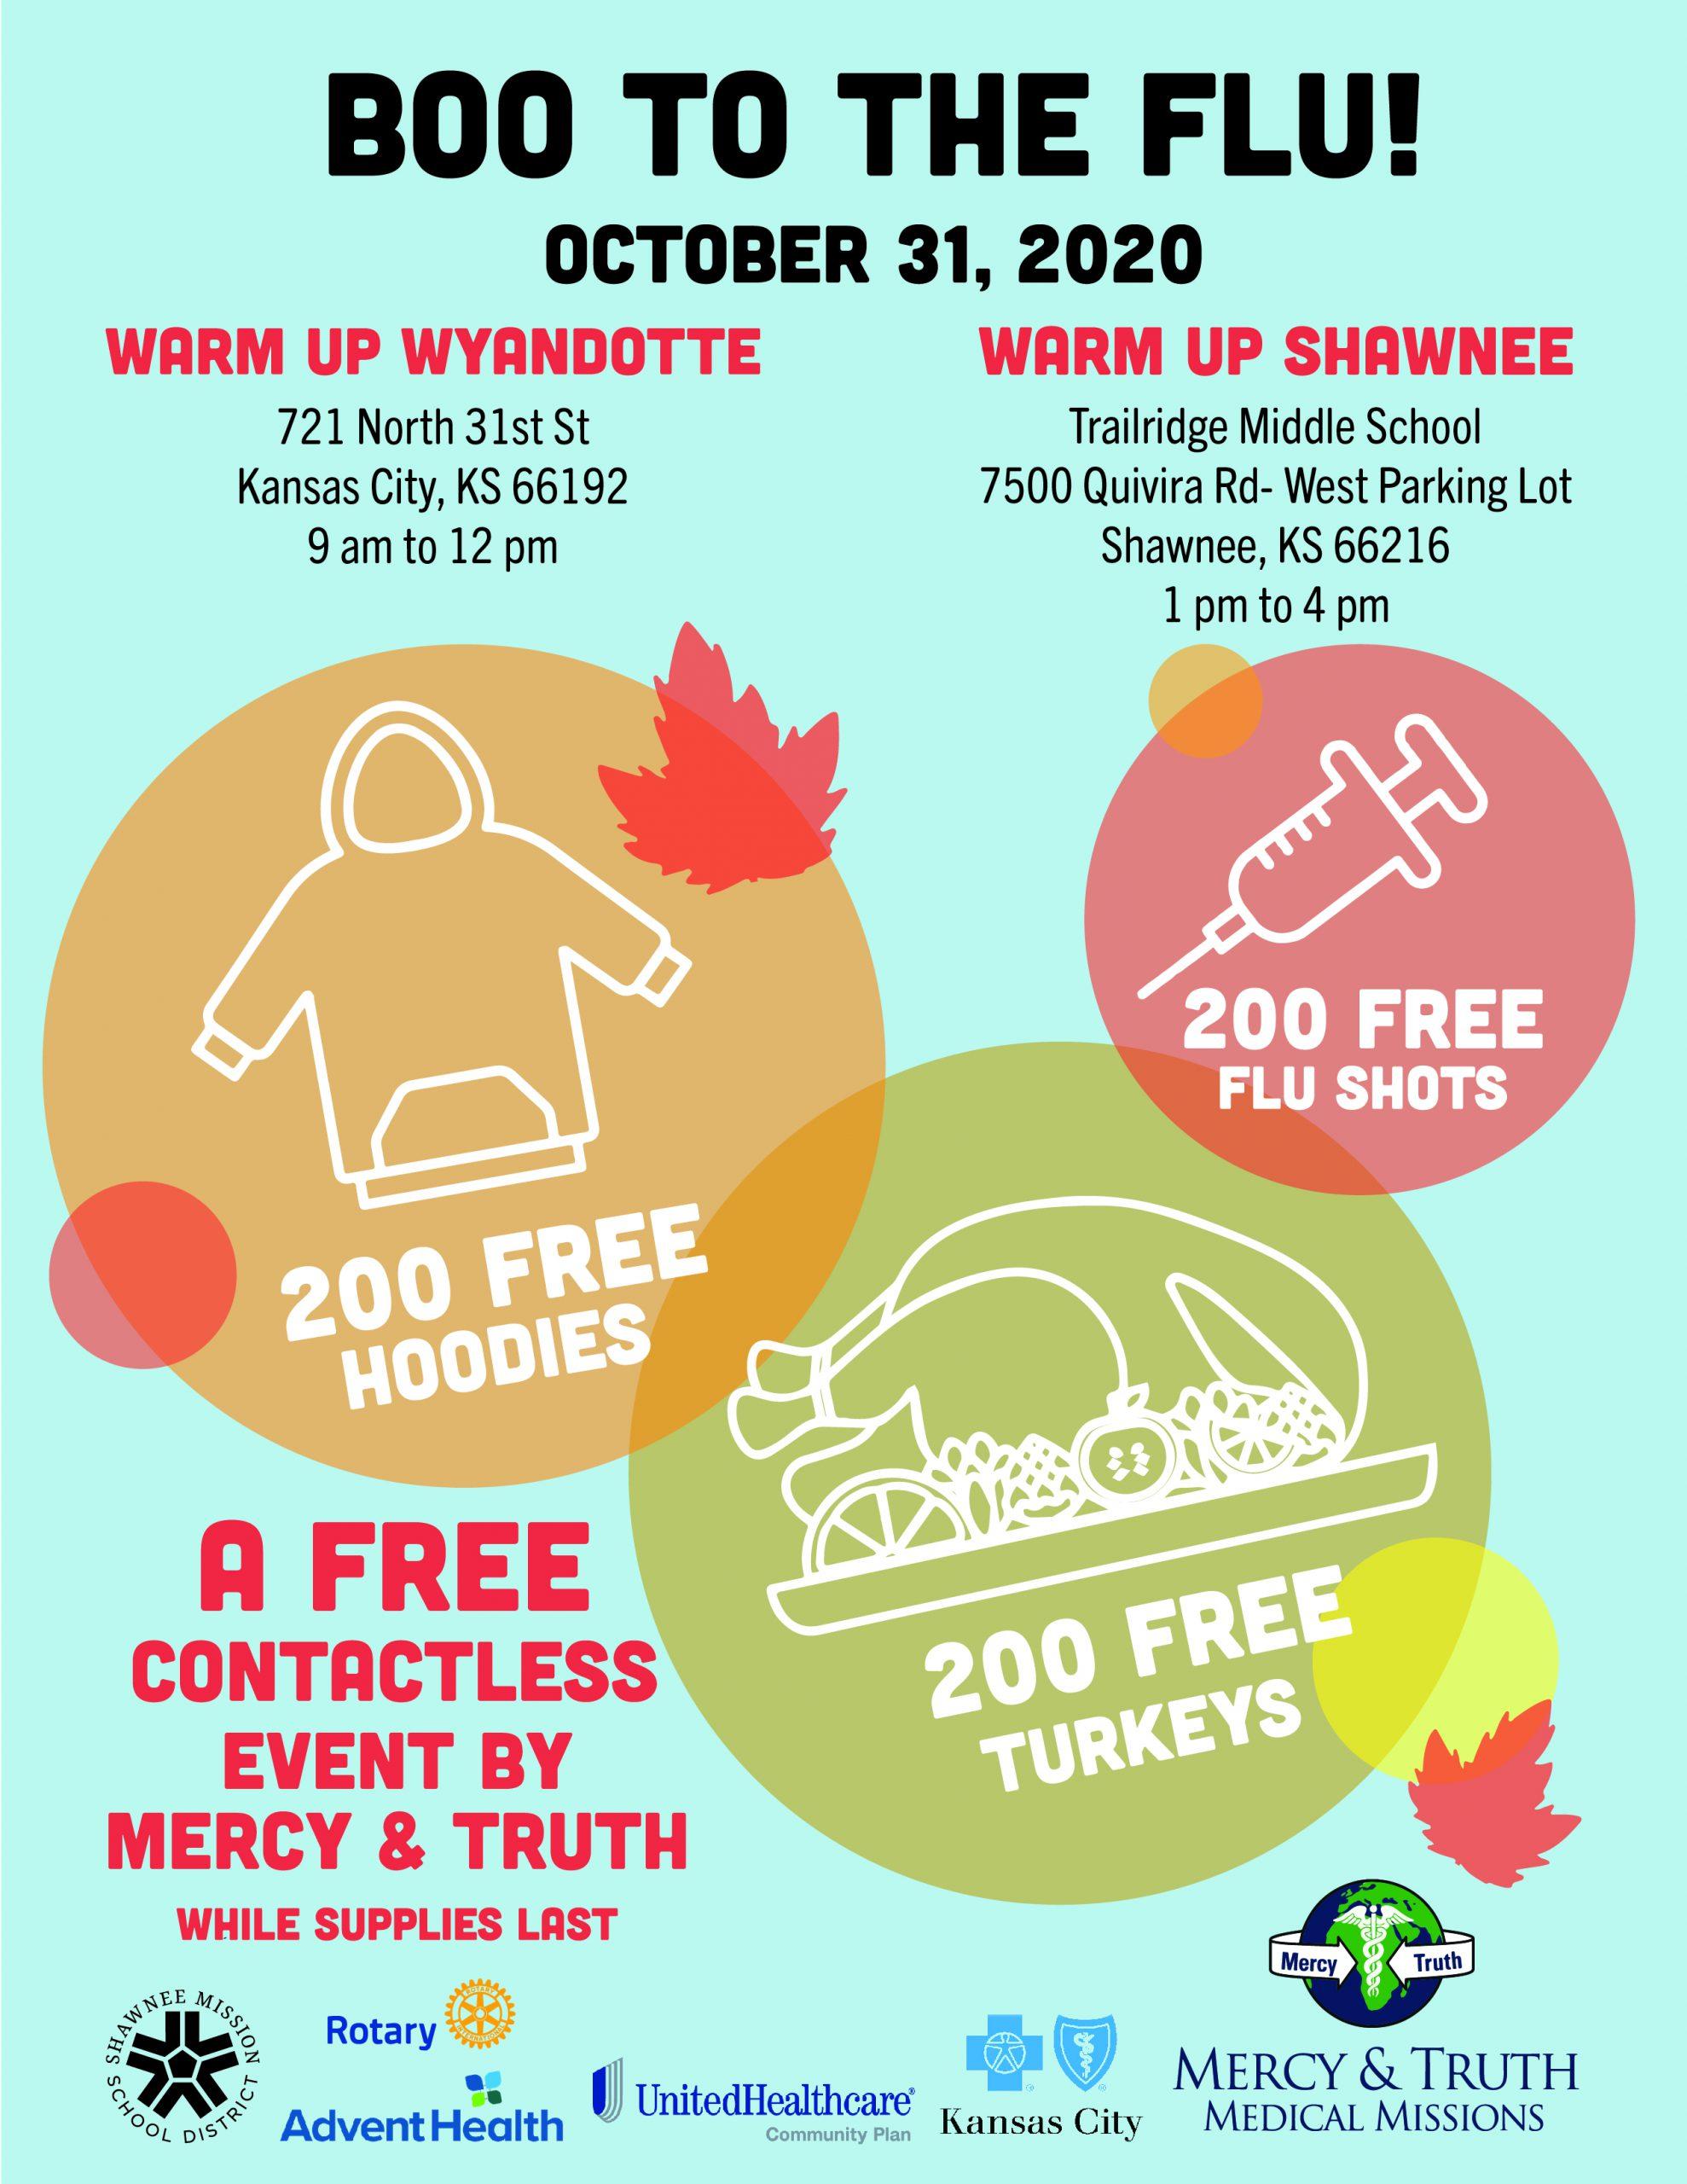 Free Flu Shots - Halloween - 721 N. 31st Street, KCK, 9am-12pm, and Trailridge Middle School in Shawnee, KS